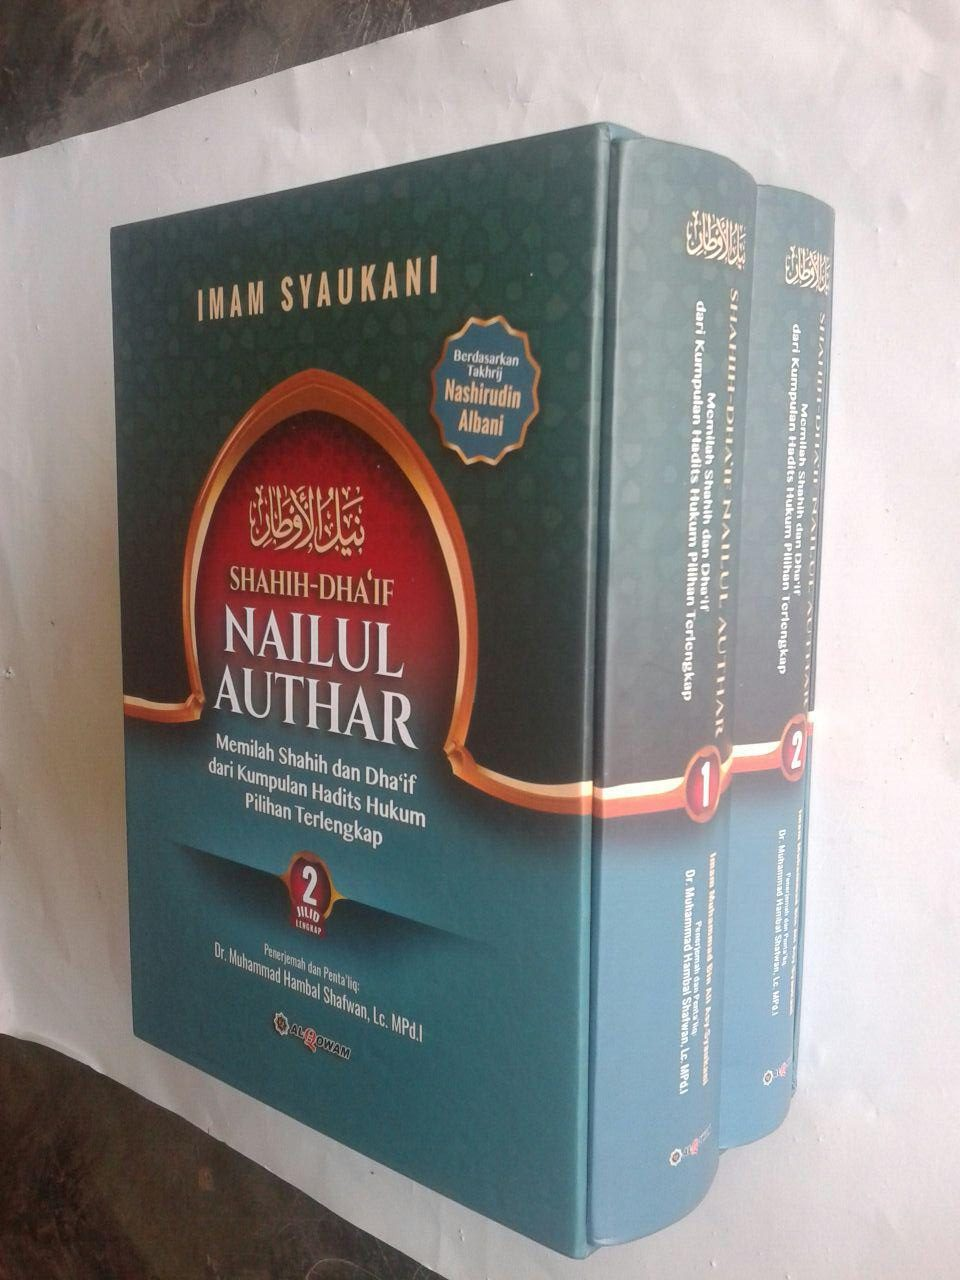 Buku Shahih Dhaif Nailul Authar Kumpulan Hadits Hukum Terlengkap cover 5